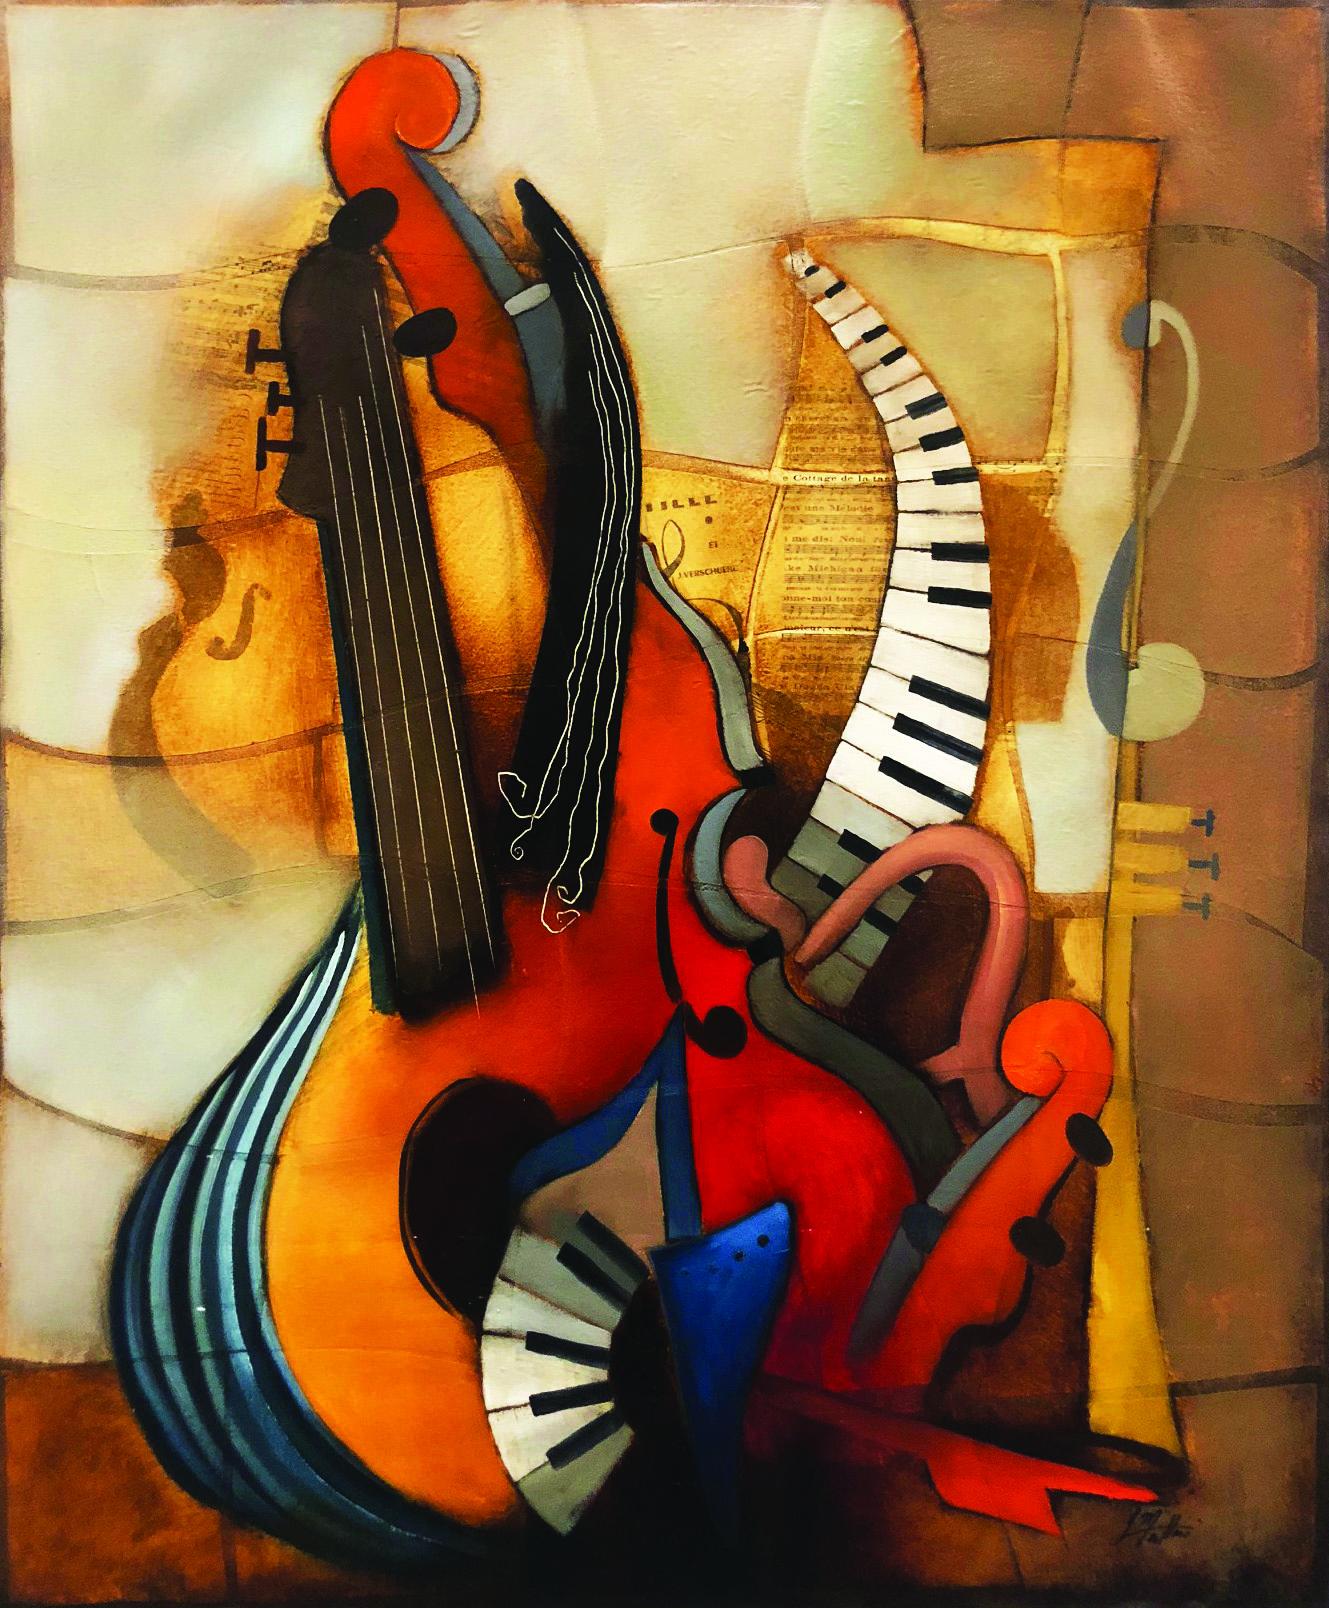 Mosaic Orchestration IX